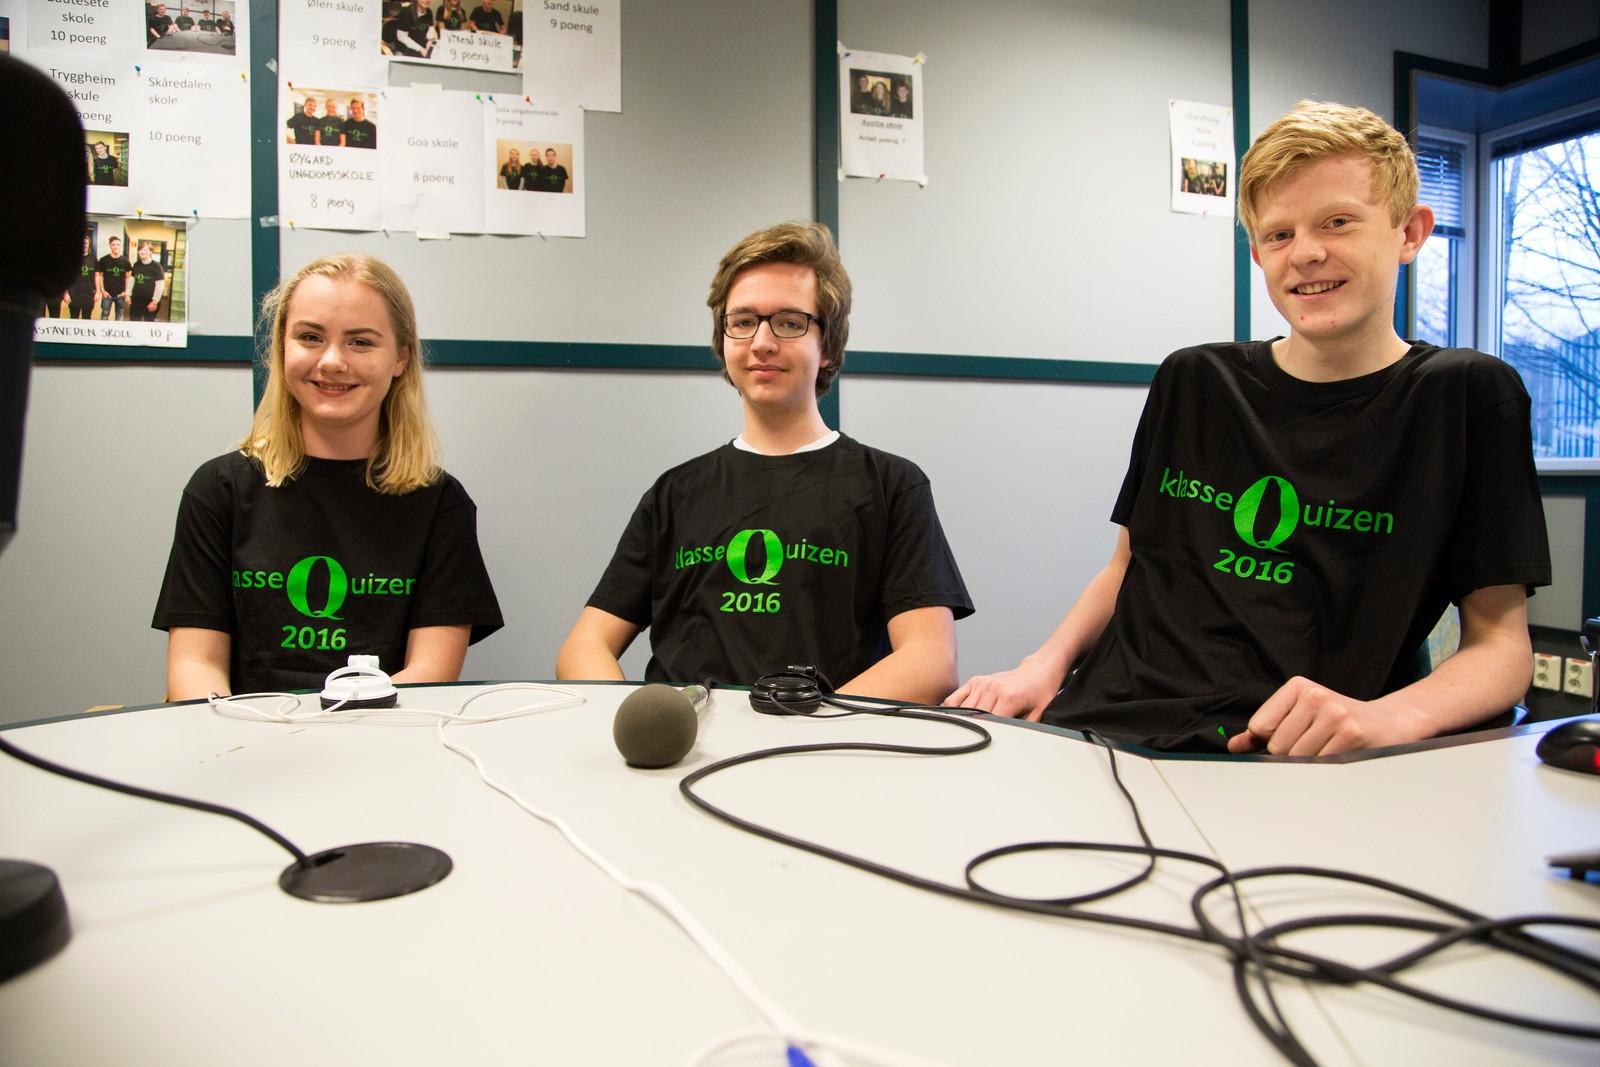 9 POENG: Kannik skole, Stavanger. Fra venstre: Malena Tjensvold Reese, Jørgen Hestnes, Johan Christie Ørke